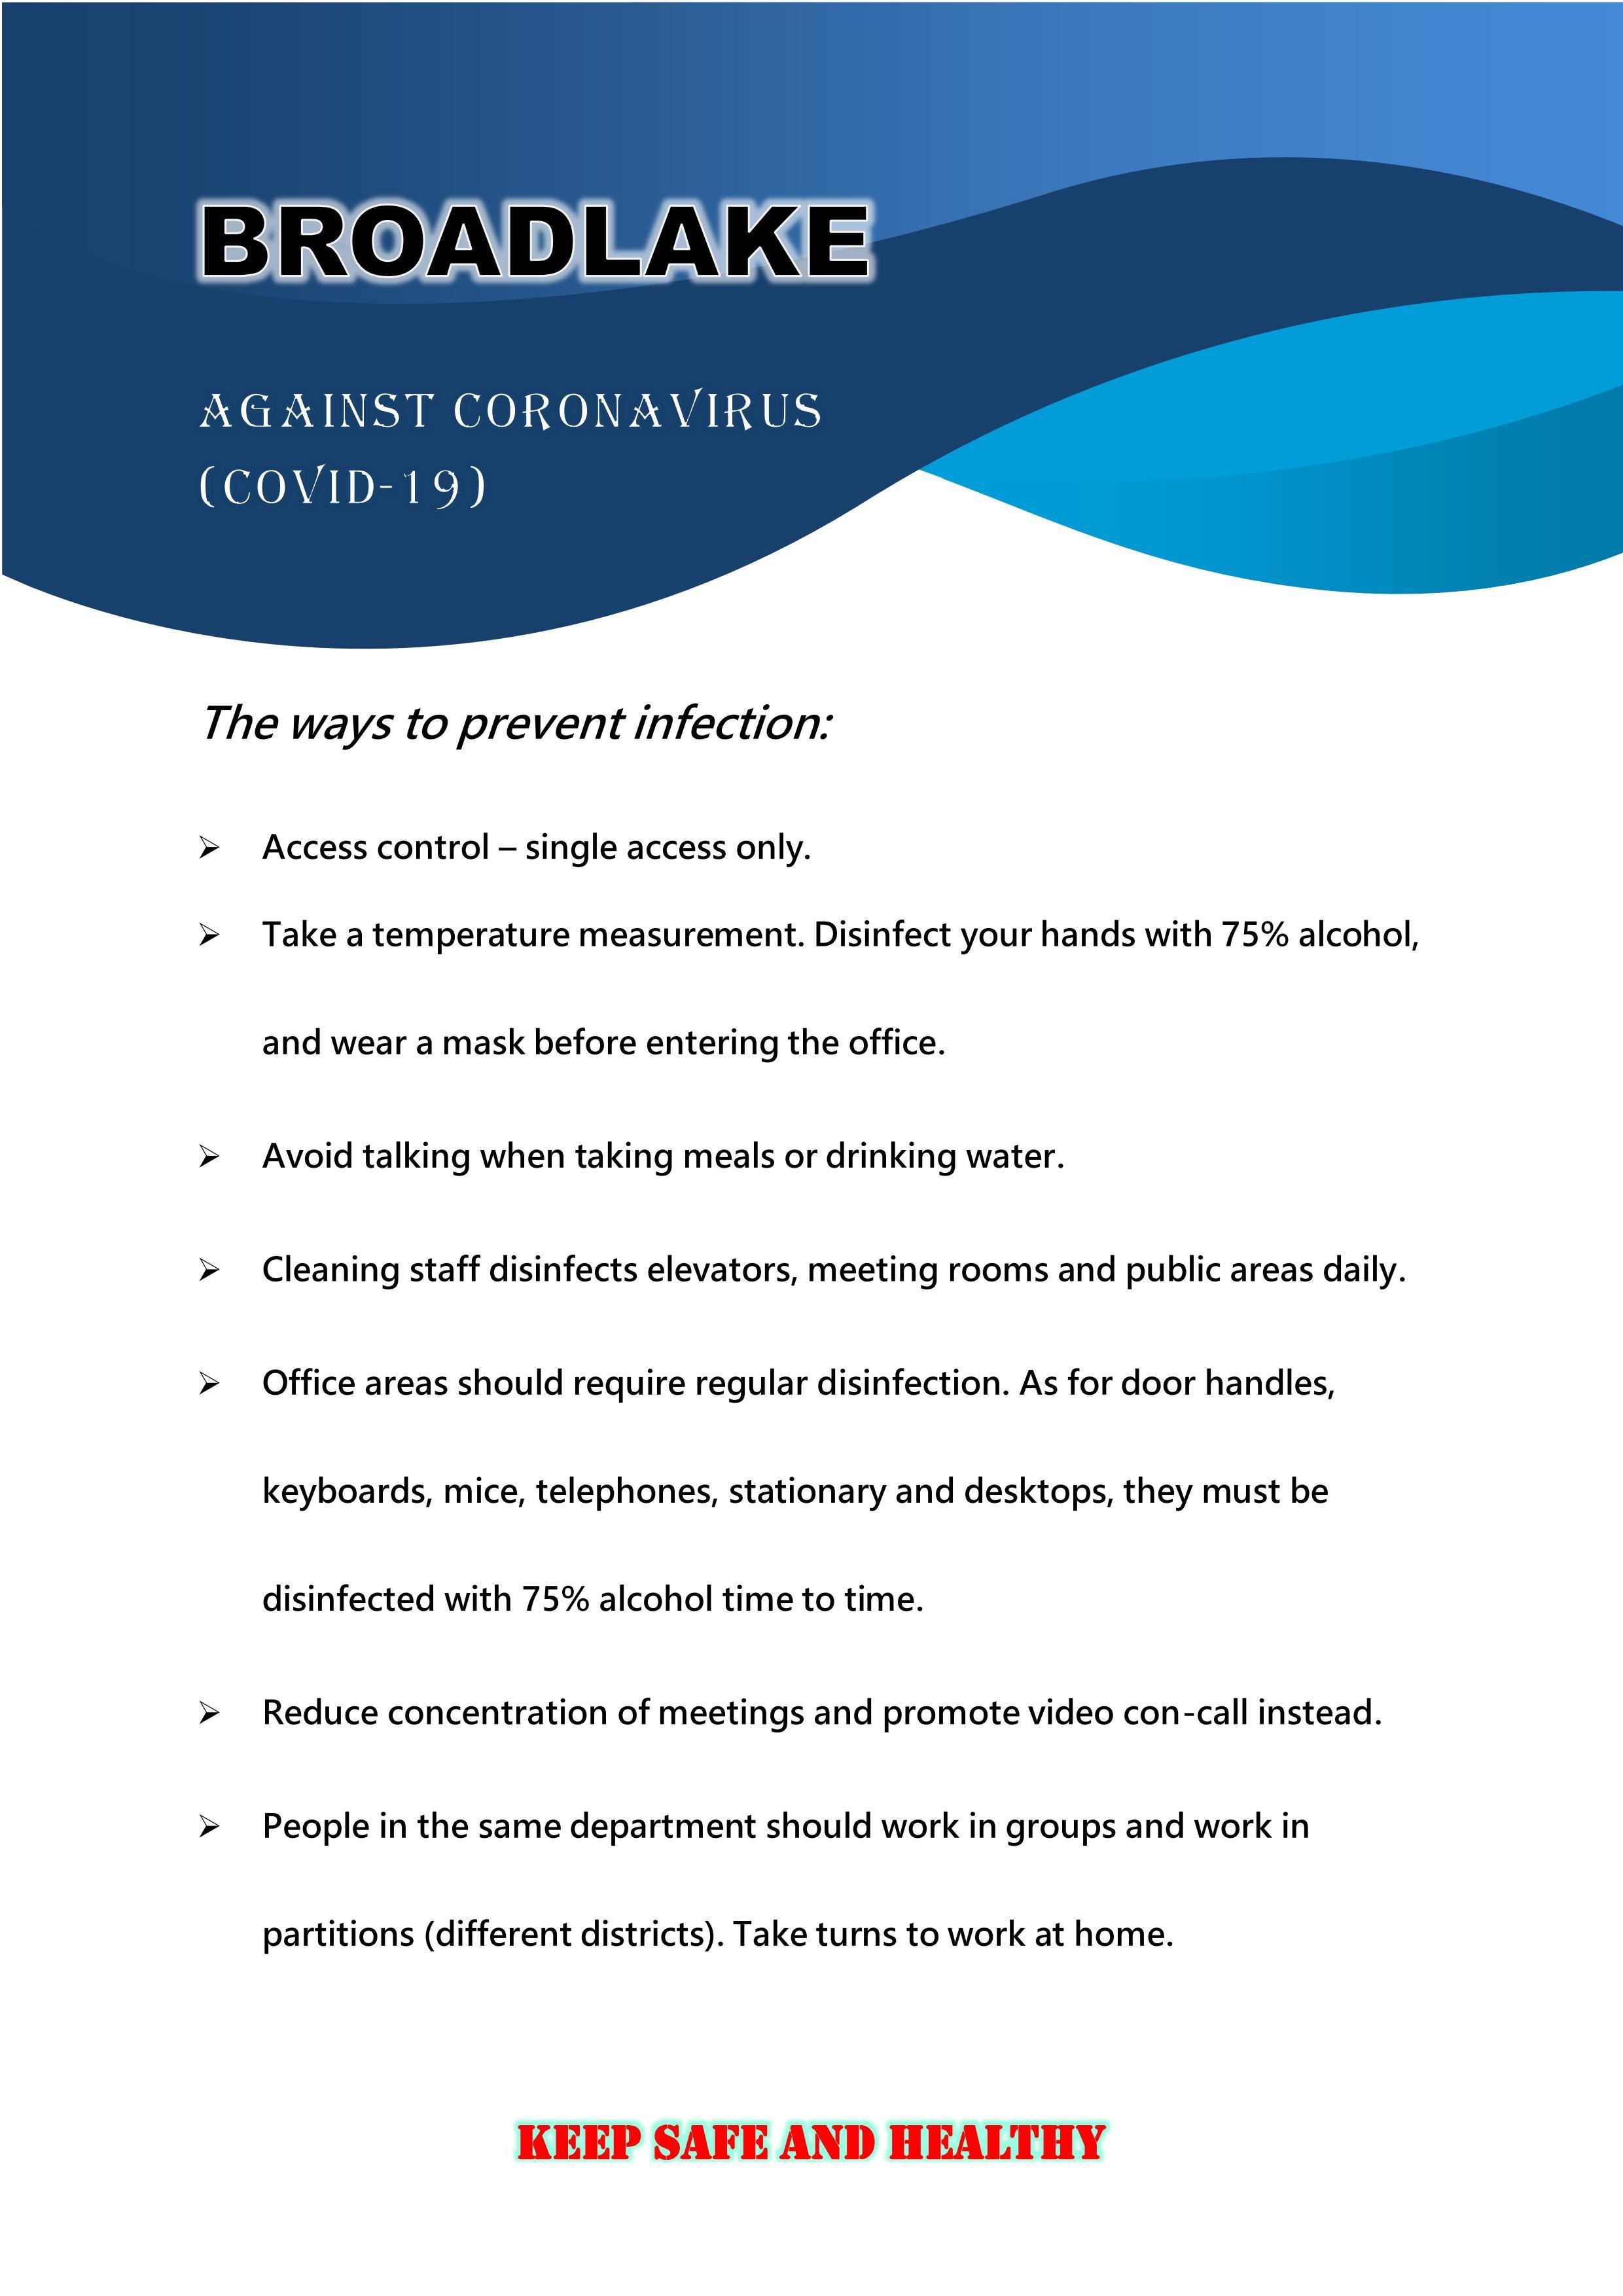 proimages/10-COMPANY_PROFILE/News/Against_Corona_Virus.jpg